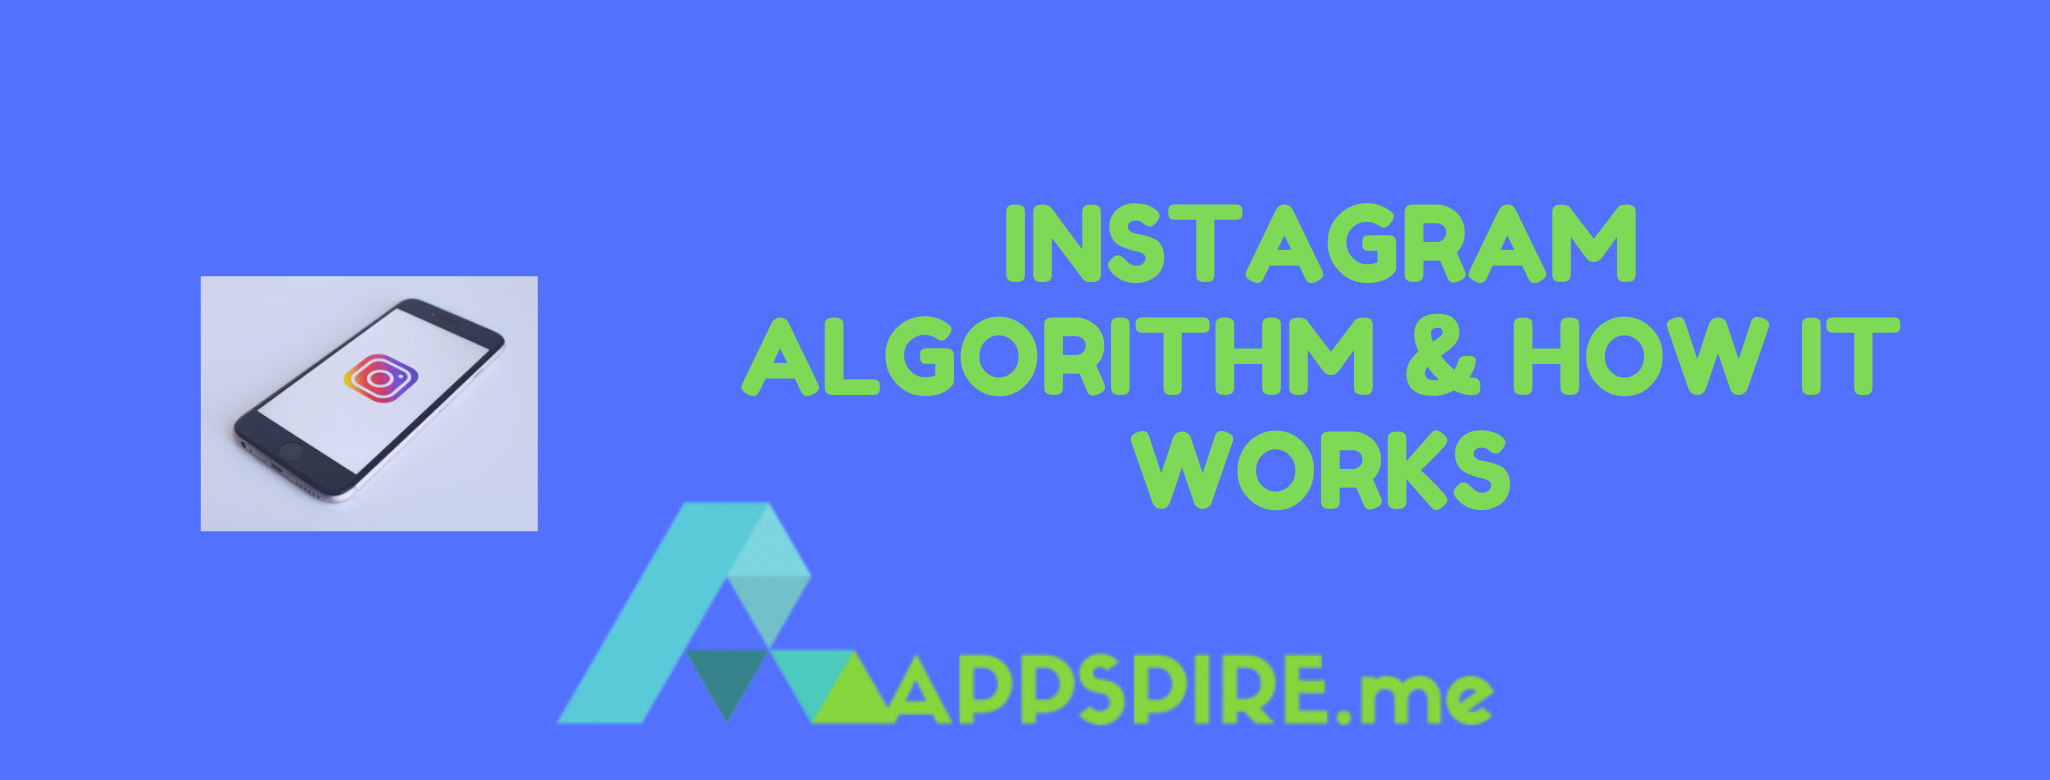 Instagram Algorithm & How It Works